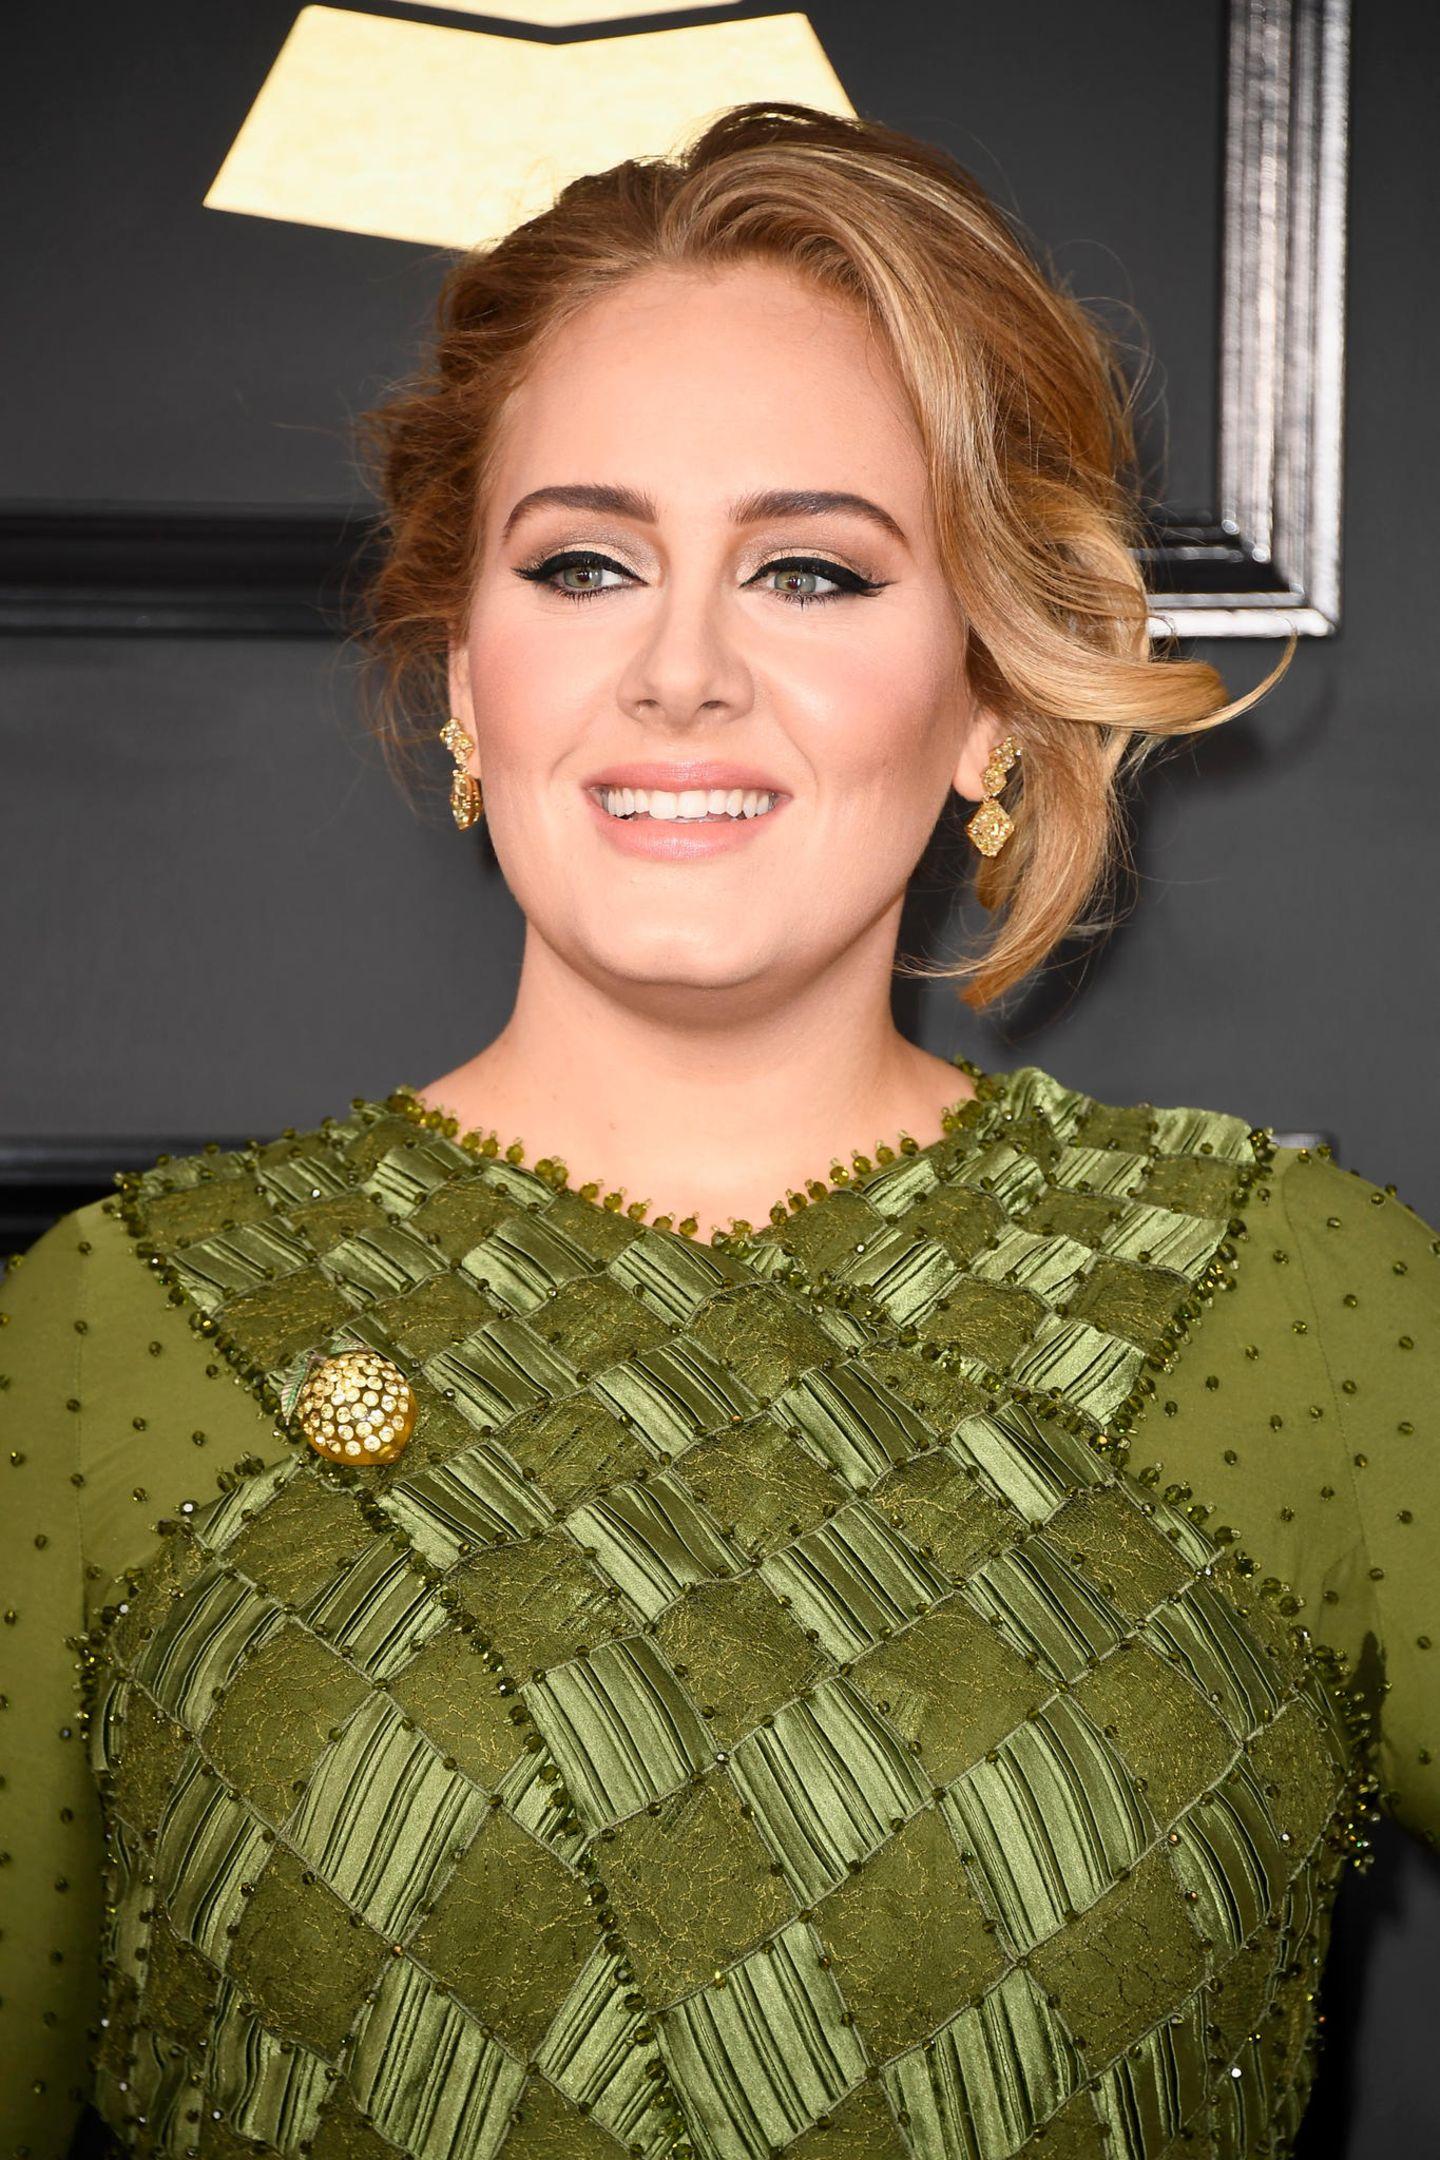 Kinderfotos der Stars: Adele